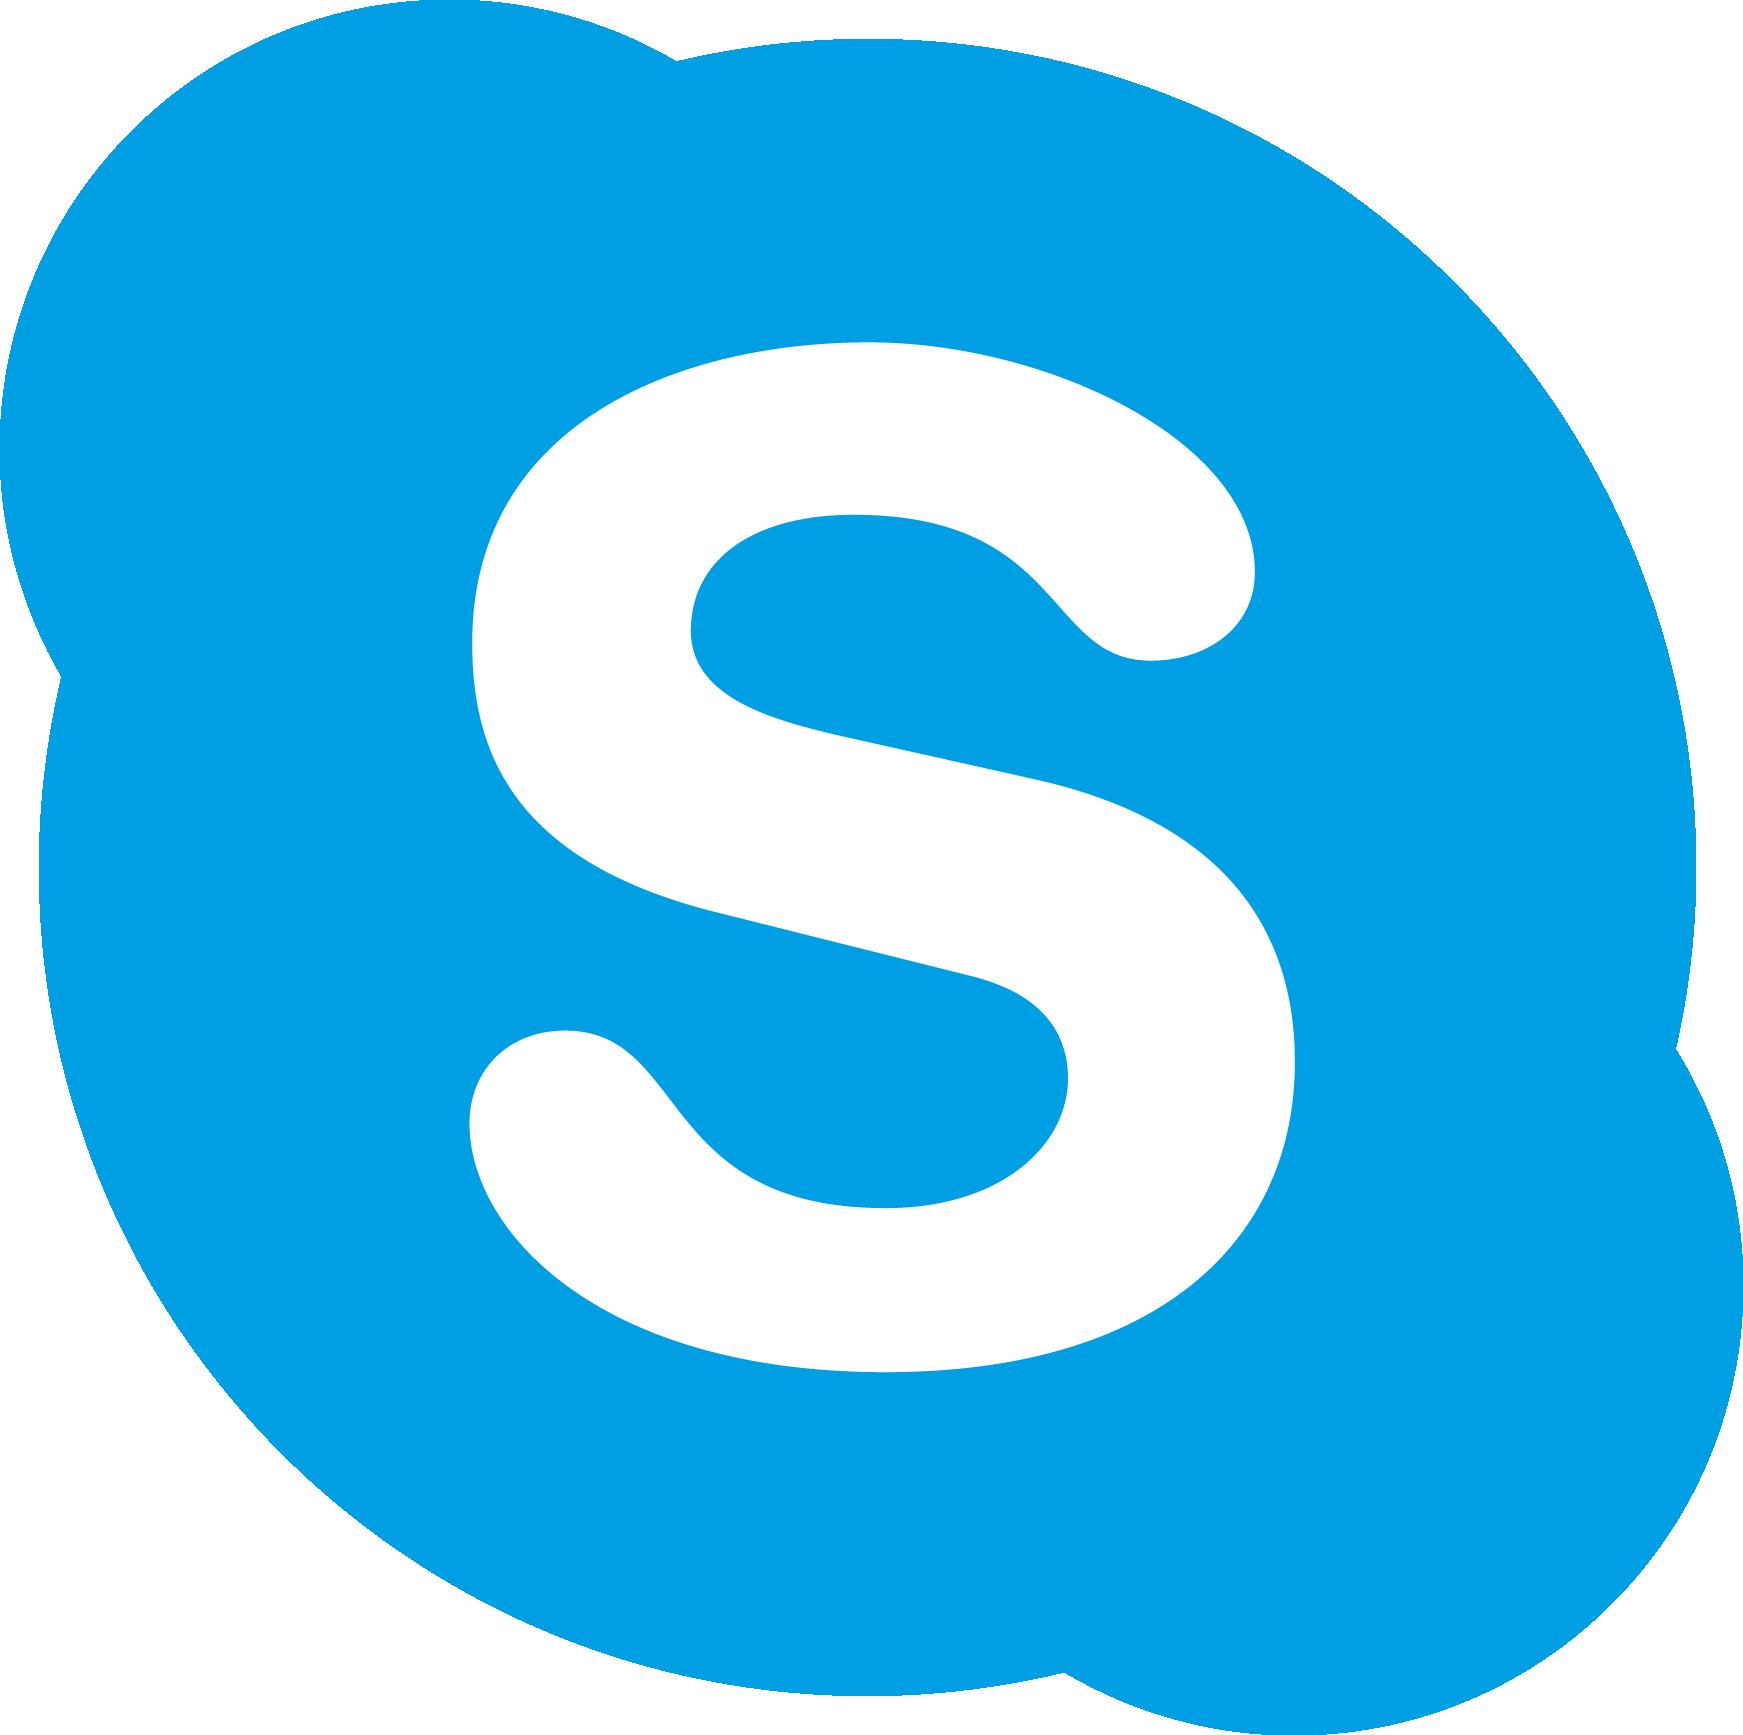 skype-logo-vector-icon-template-clipart-download-0